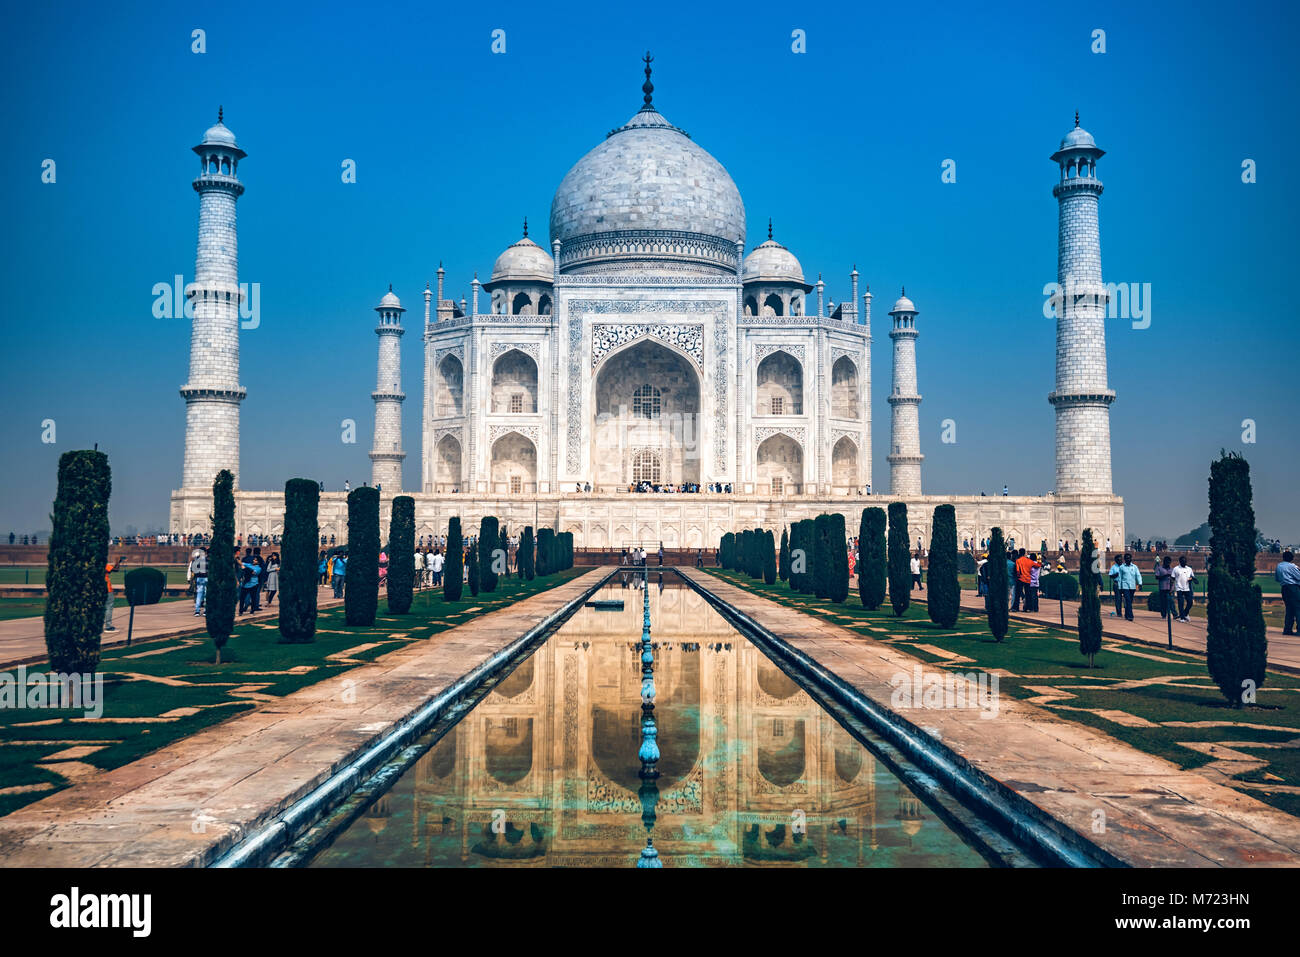 AGRA, INDE - Novembre 8, 2017: Taj Mahal vue panoramique à Agra, en Inde. Photo Stock